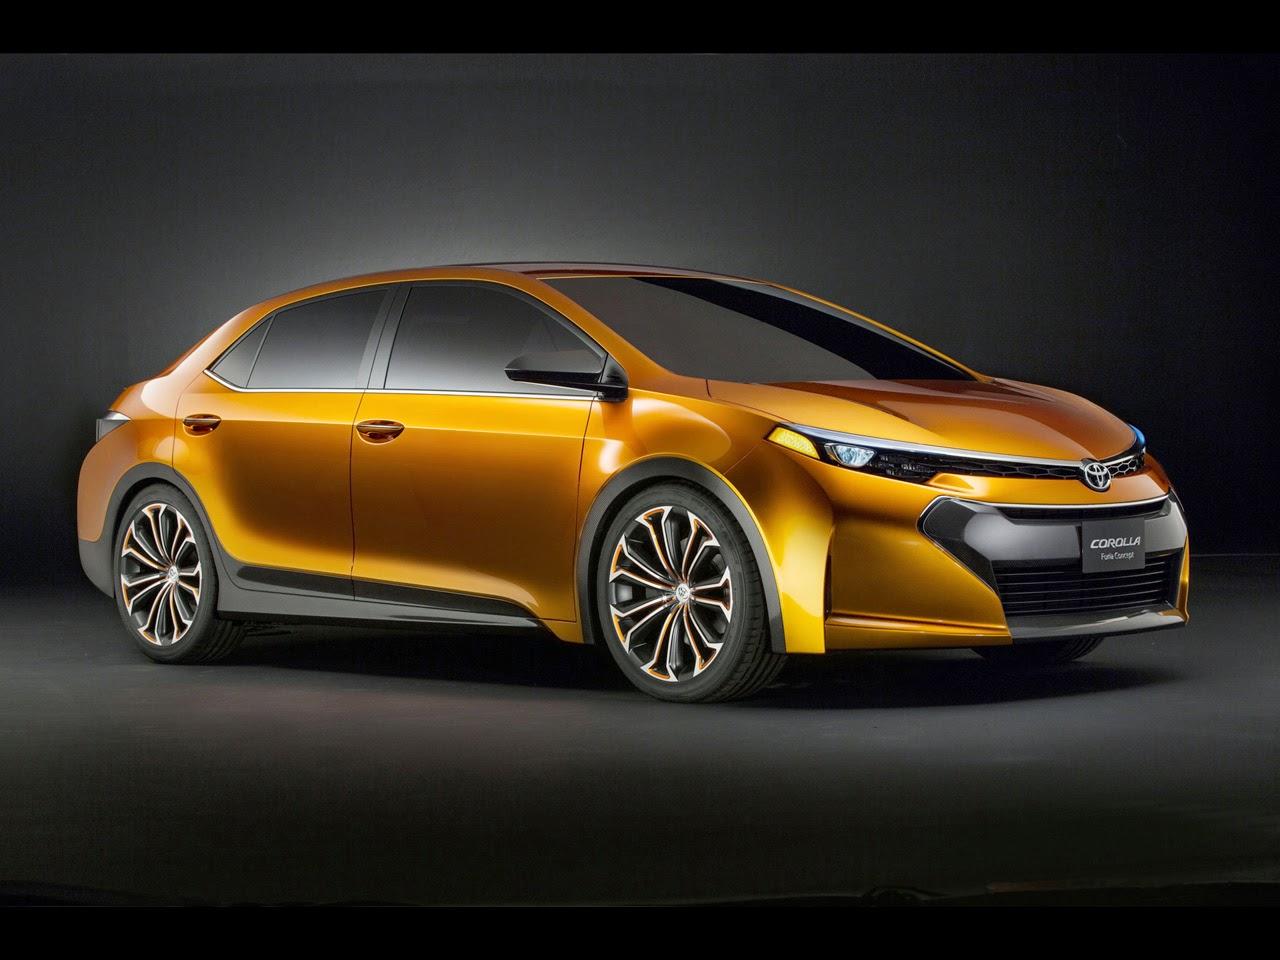 Amazing Toyota Corolla Furia Concept Car